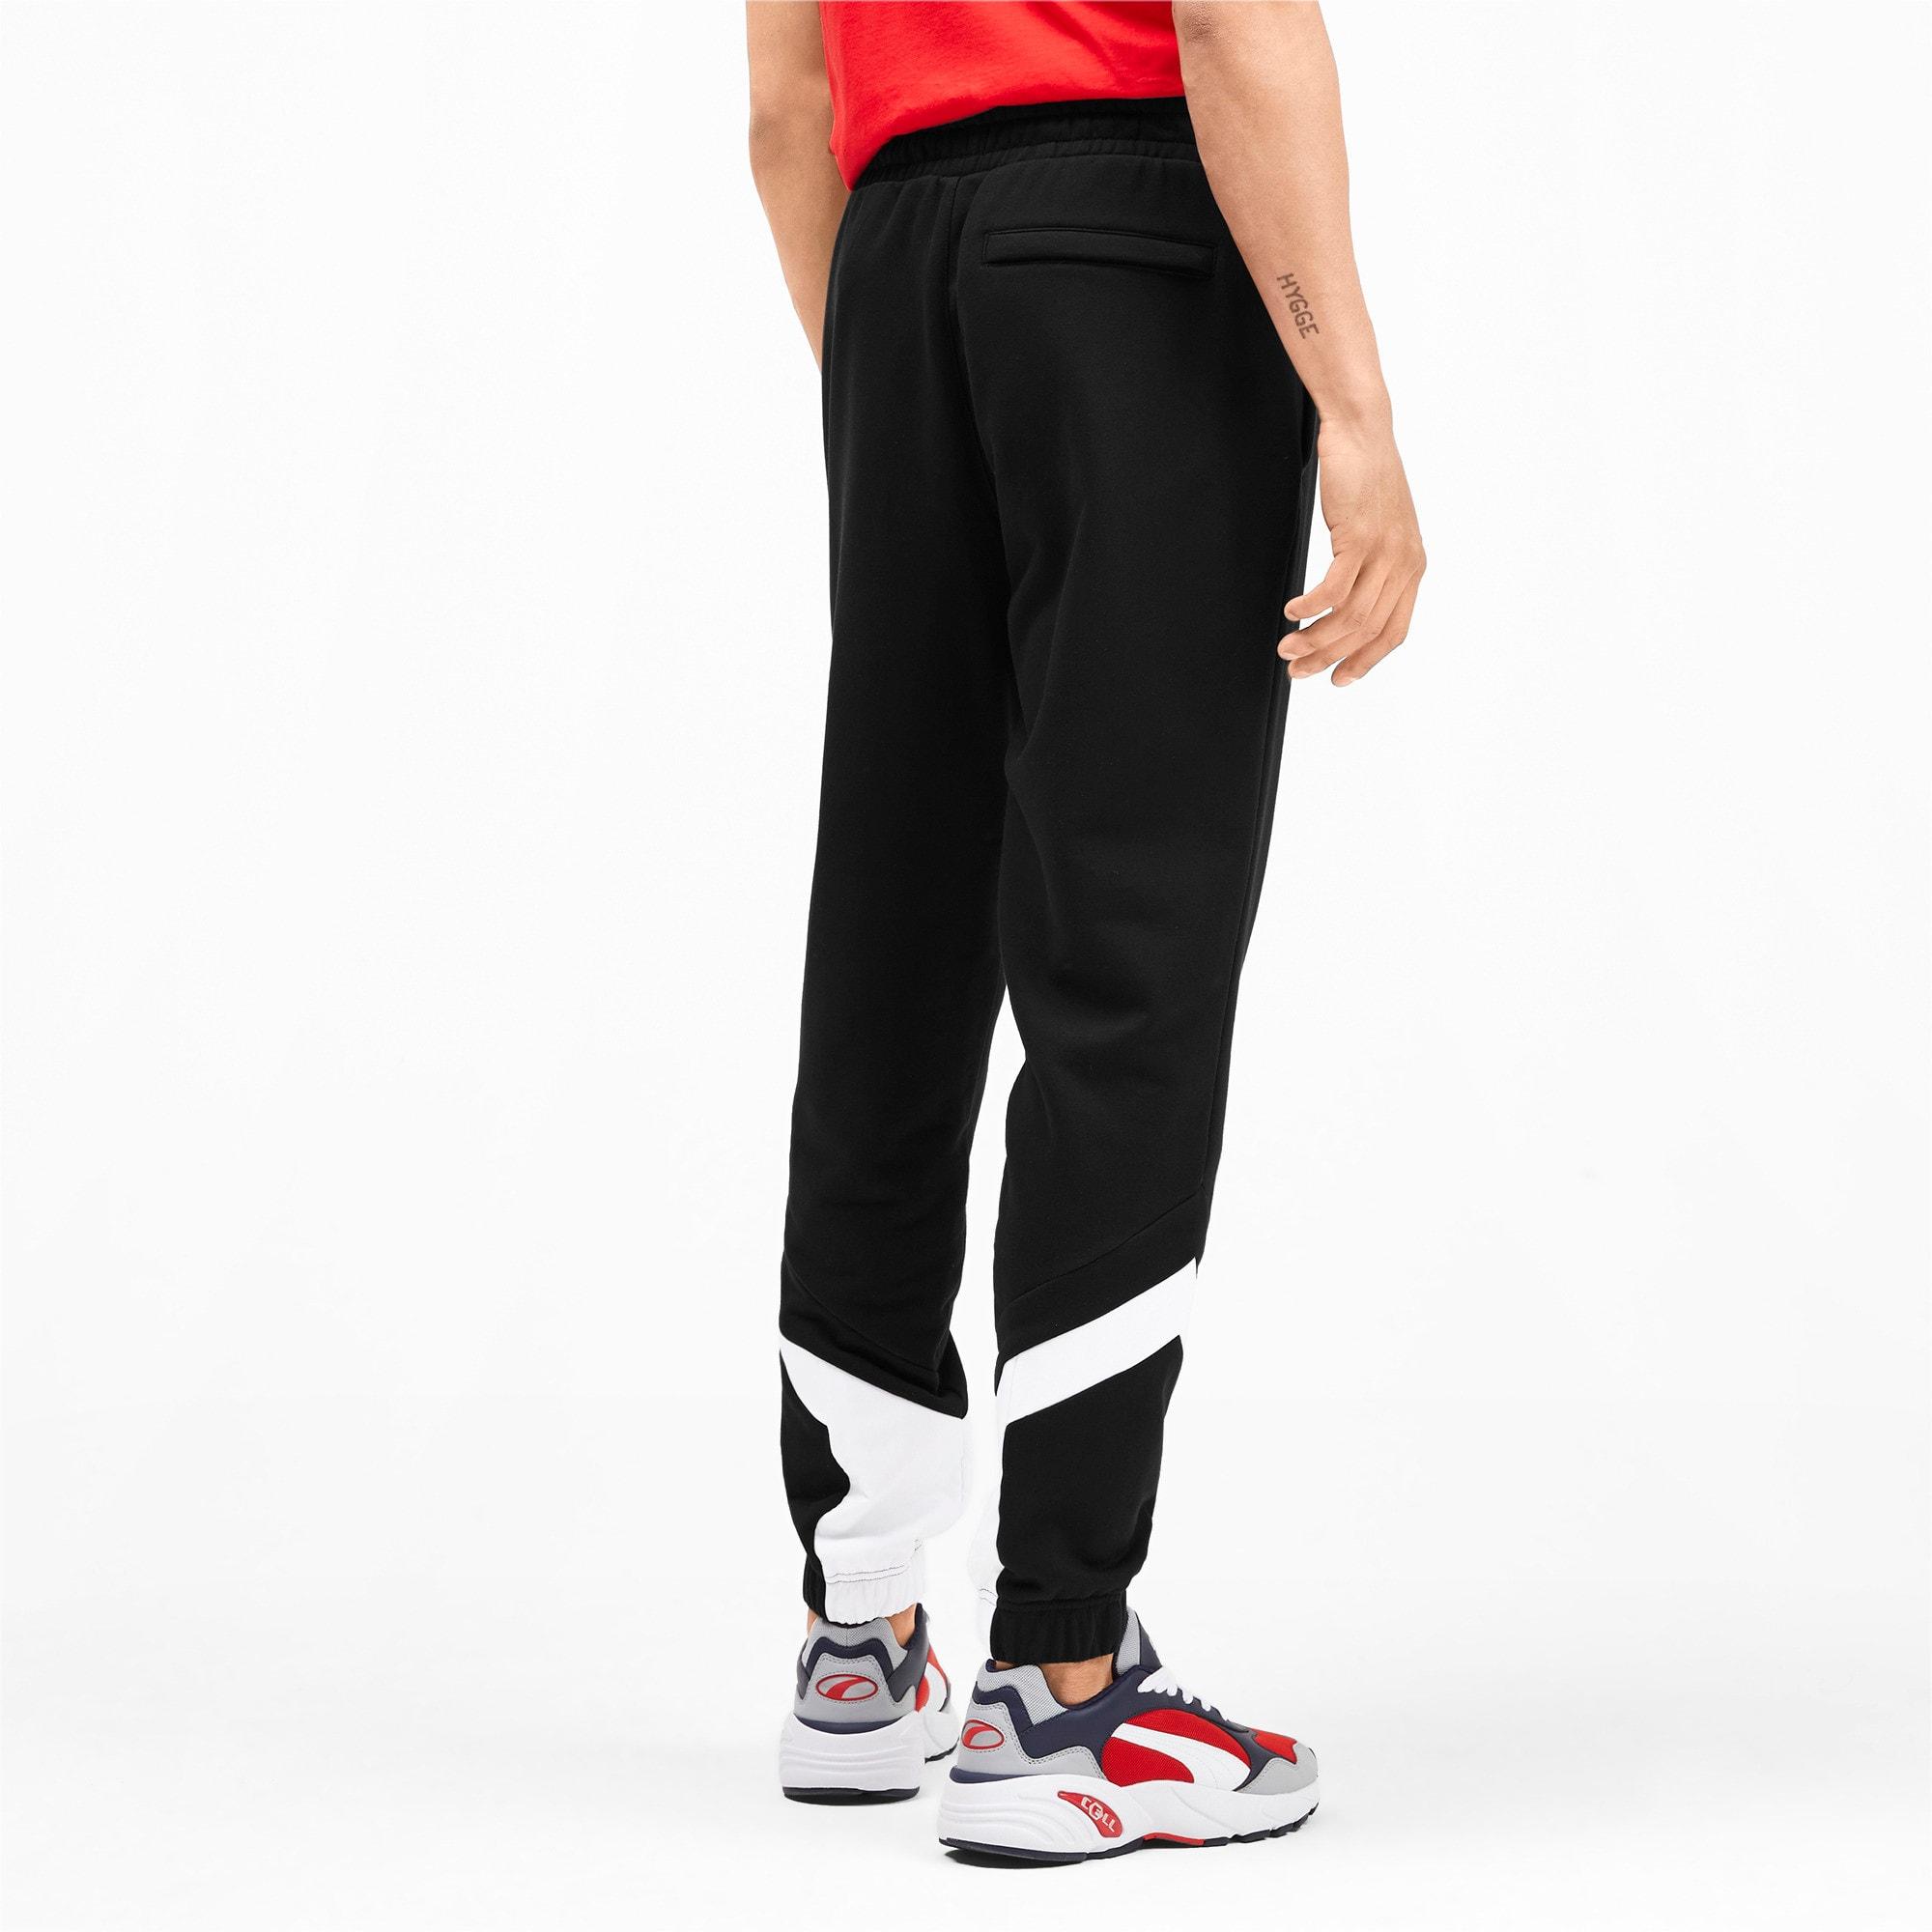 Miniatura 3 de Pantalones deportivos Iconic MCS de hombre, Puma Black, mediano